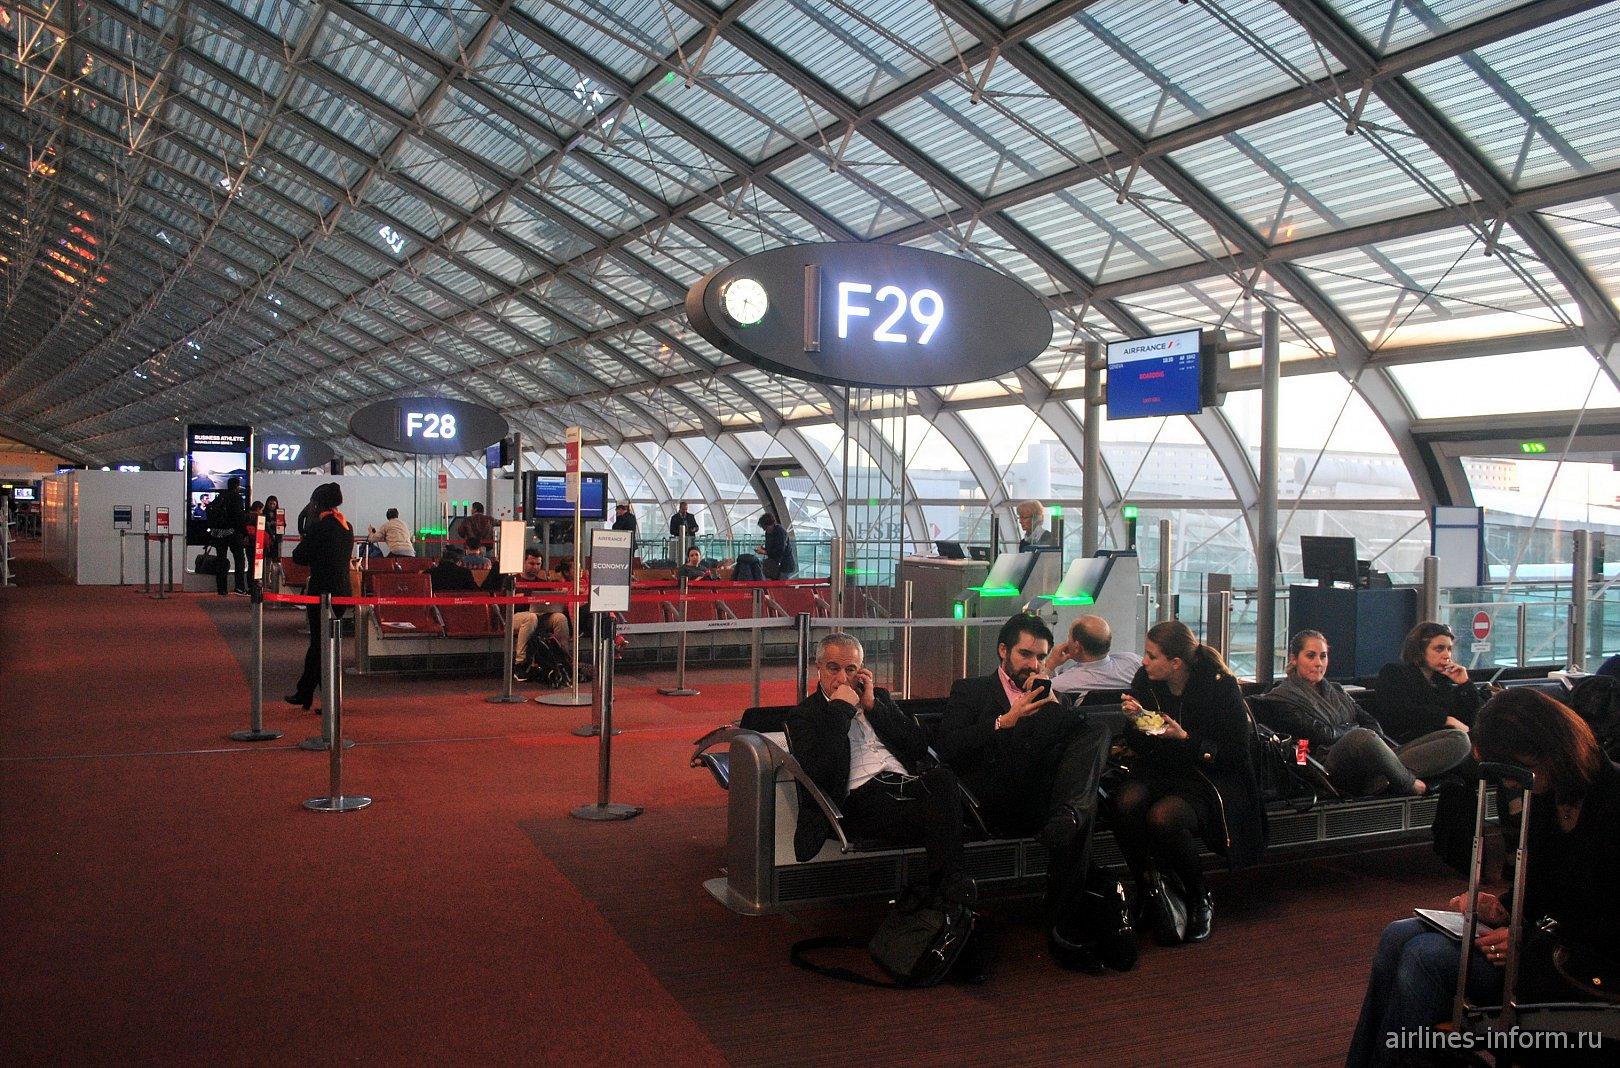 Выходы на посадку в конкорсе F терминала 2 аэропорта Париж Шарль-де-Голль